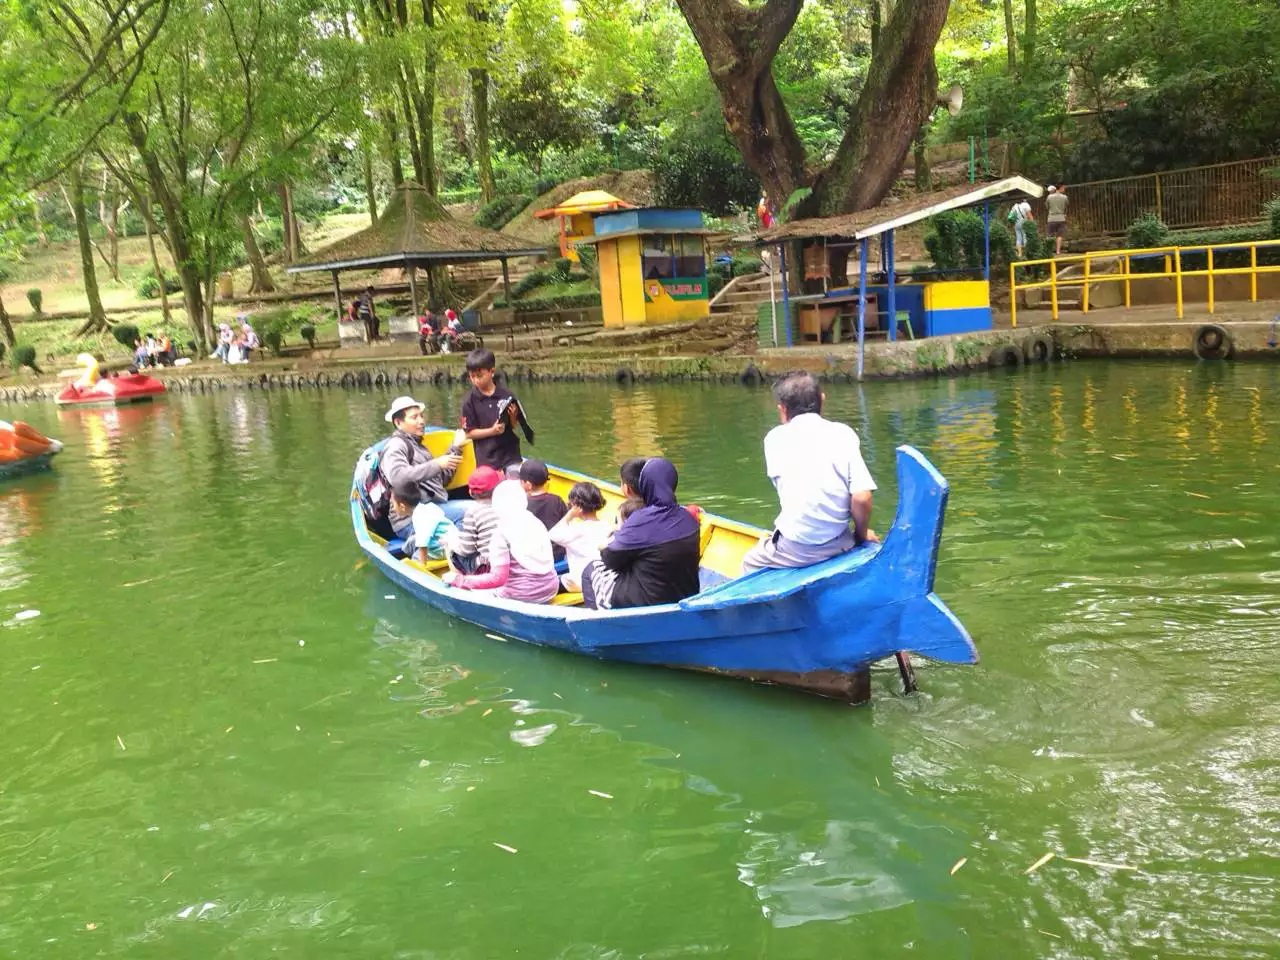 artificial lake in bandung zoo for recreation